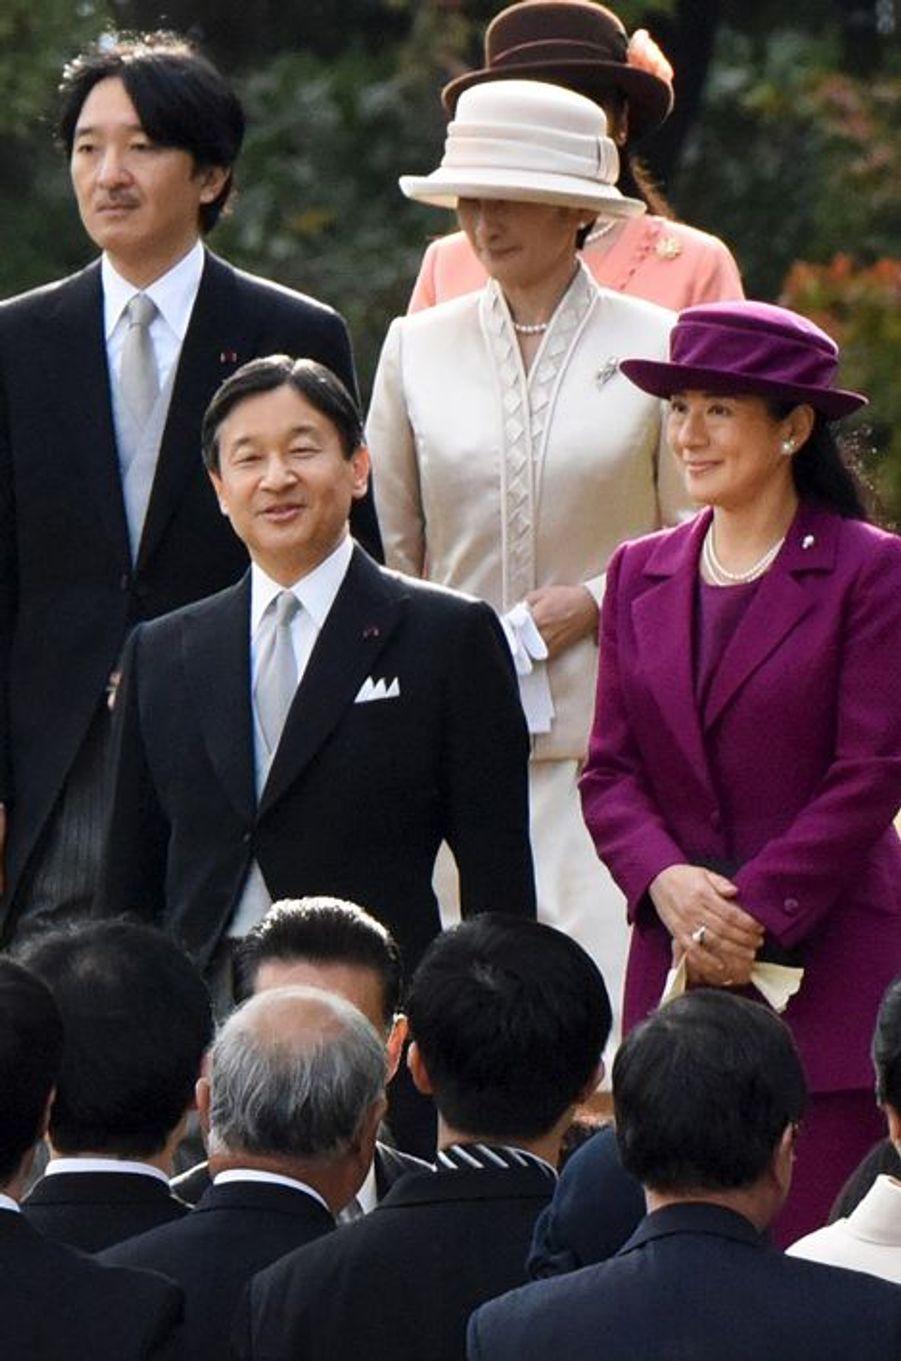 Les princesses Masako et Kiko et les princes Naruhito et Akishino du Japon à Tokyo, le 12 novembre 2015